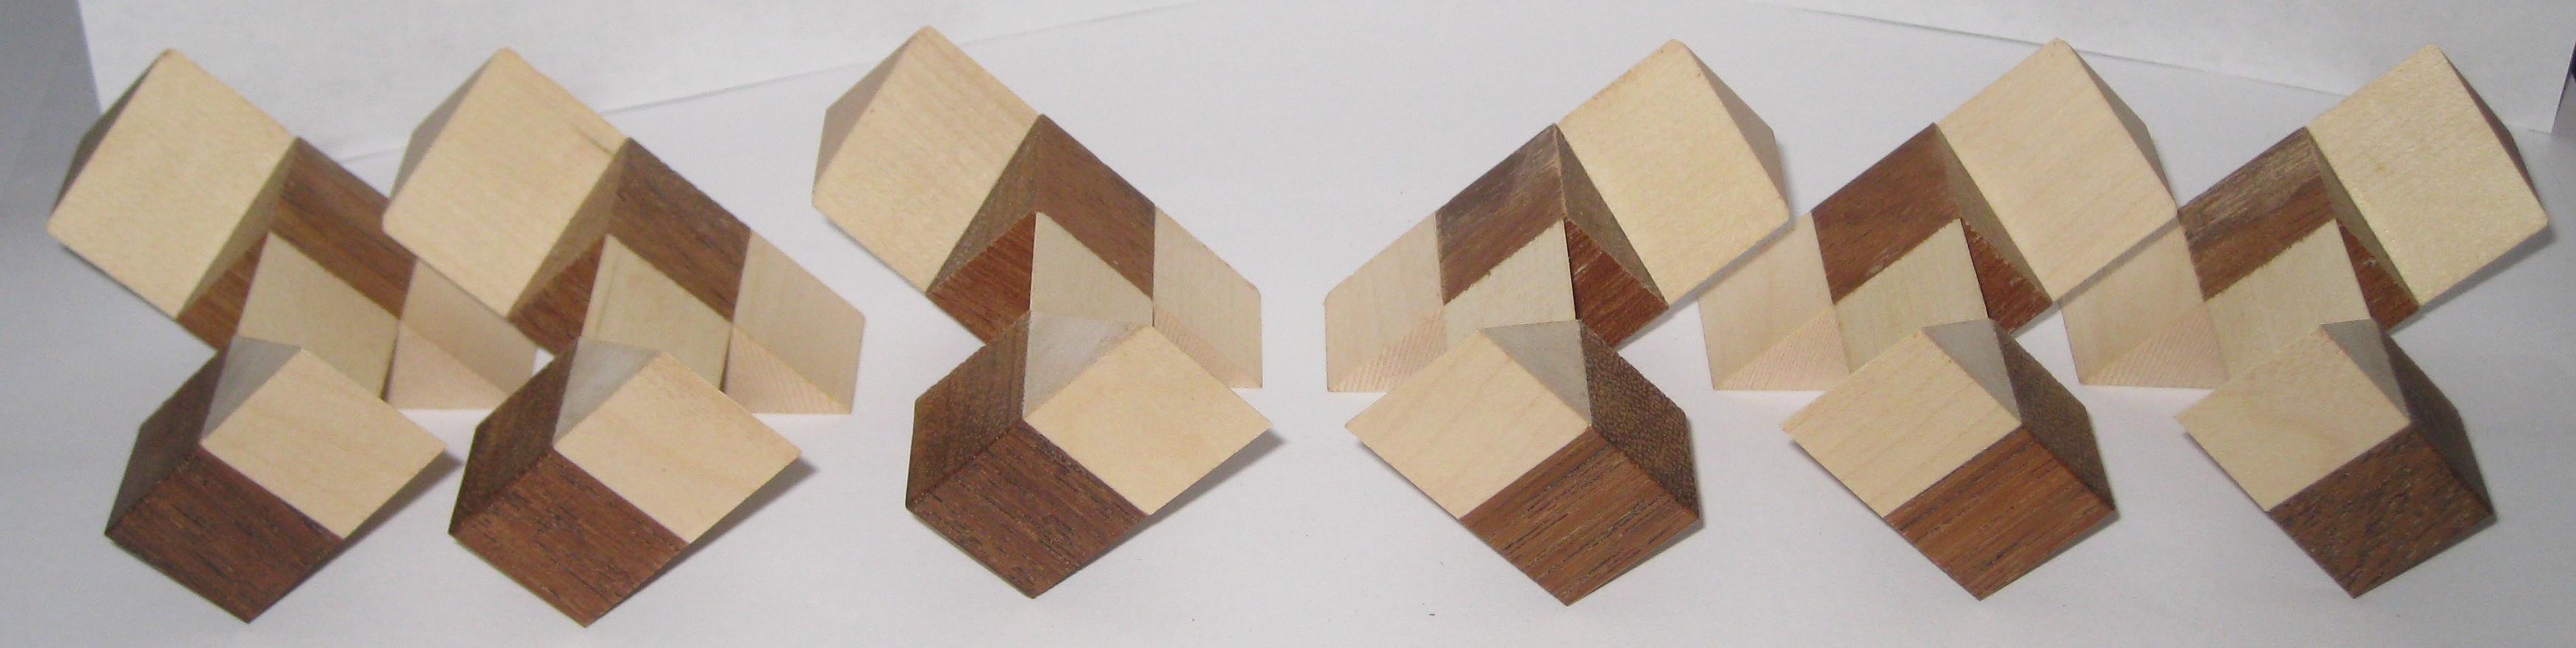 6 Piece Cube pieces